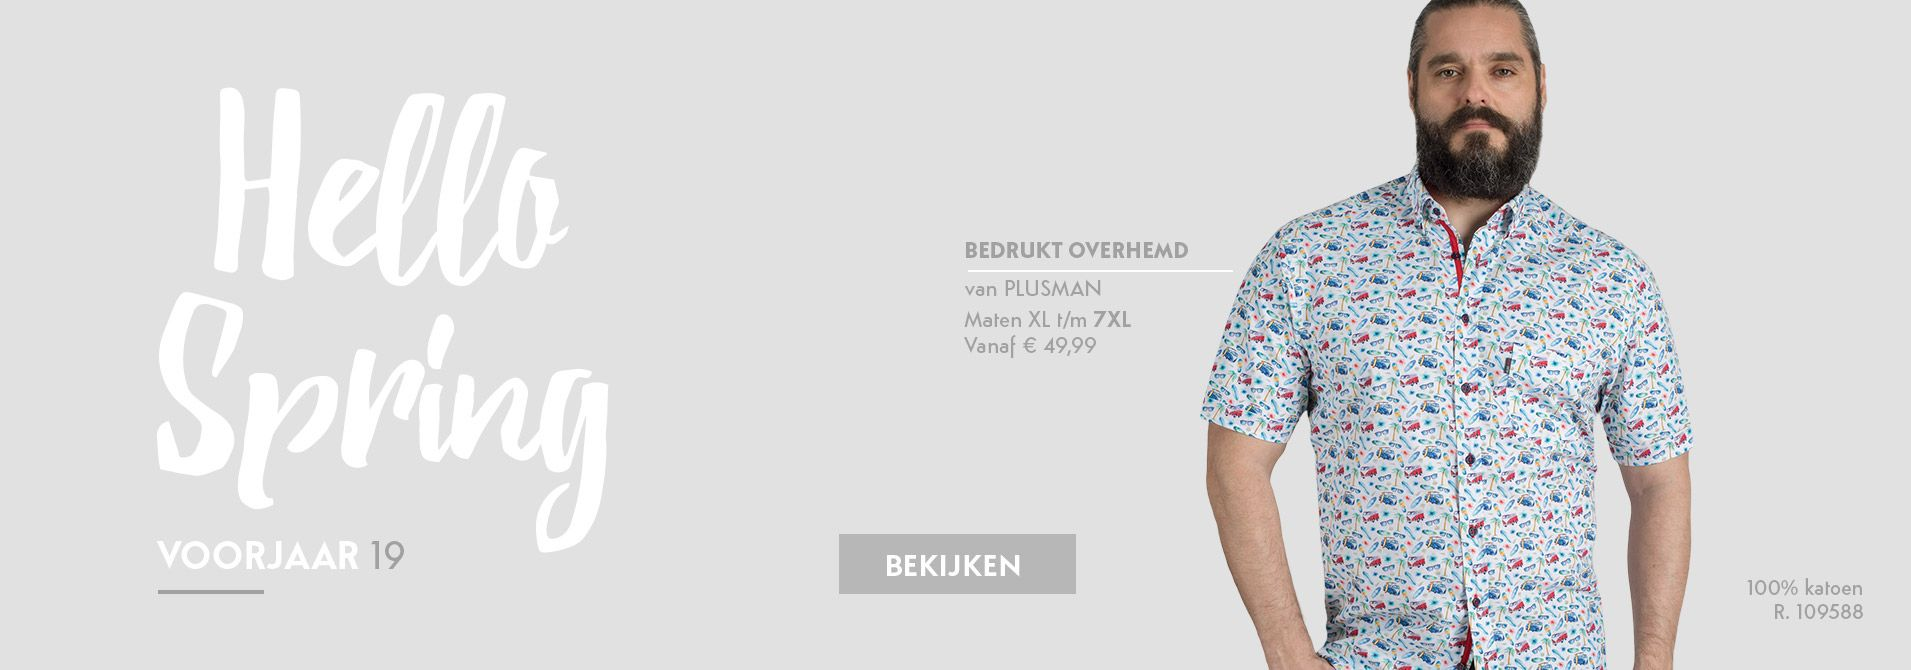 285f680271b31b Grote maten overhemd